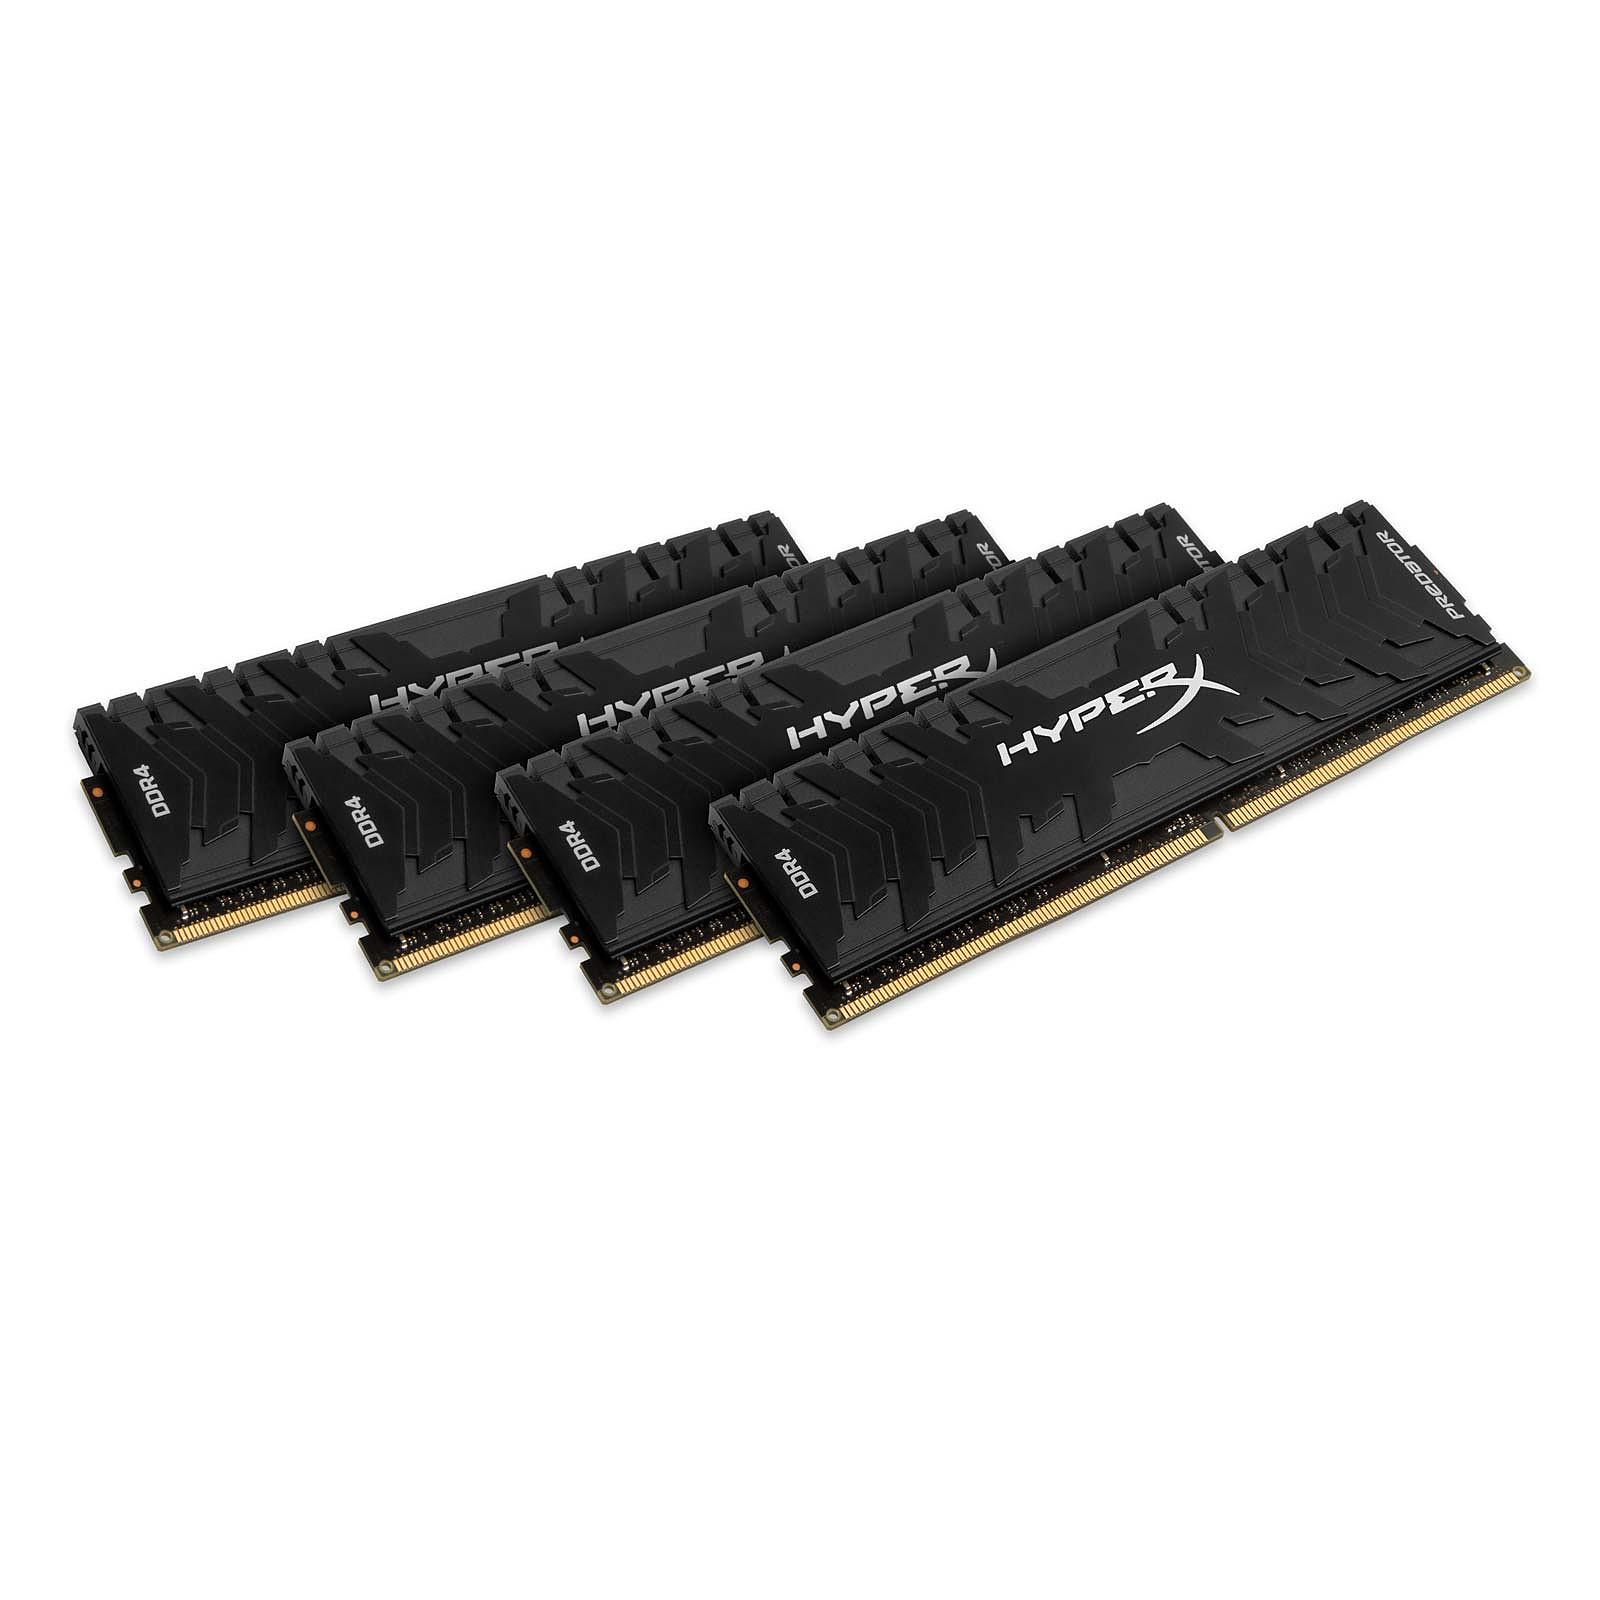 HyperX Predator Noir 32 Go (4x 8 Go) DDR4 2666 MHz CL13